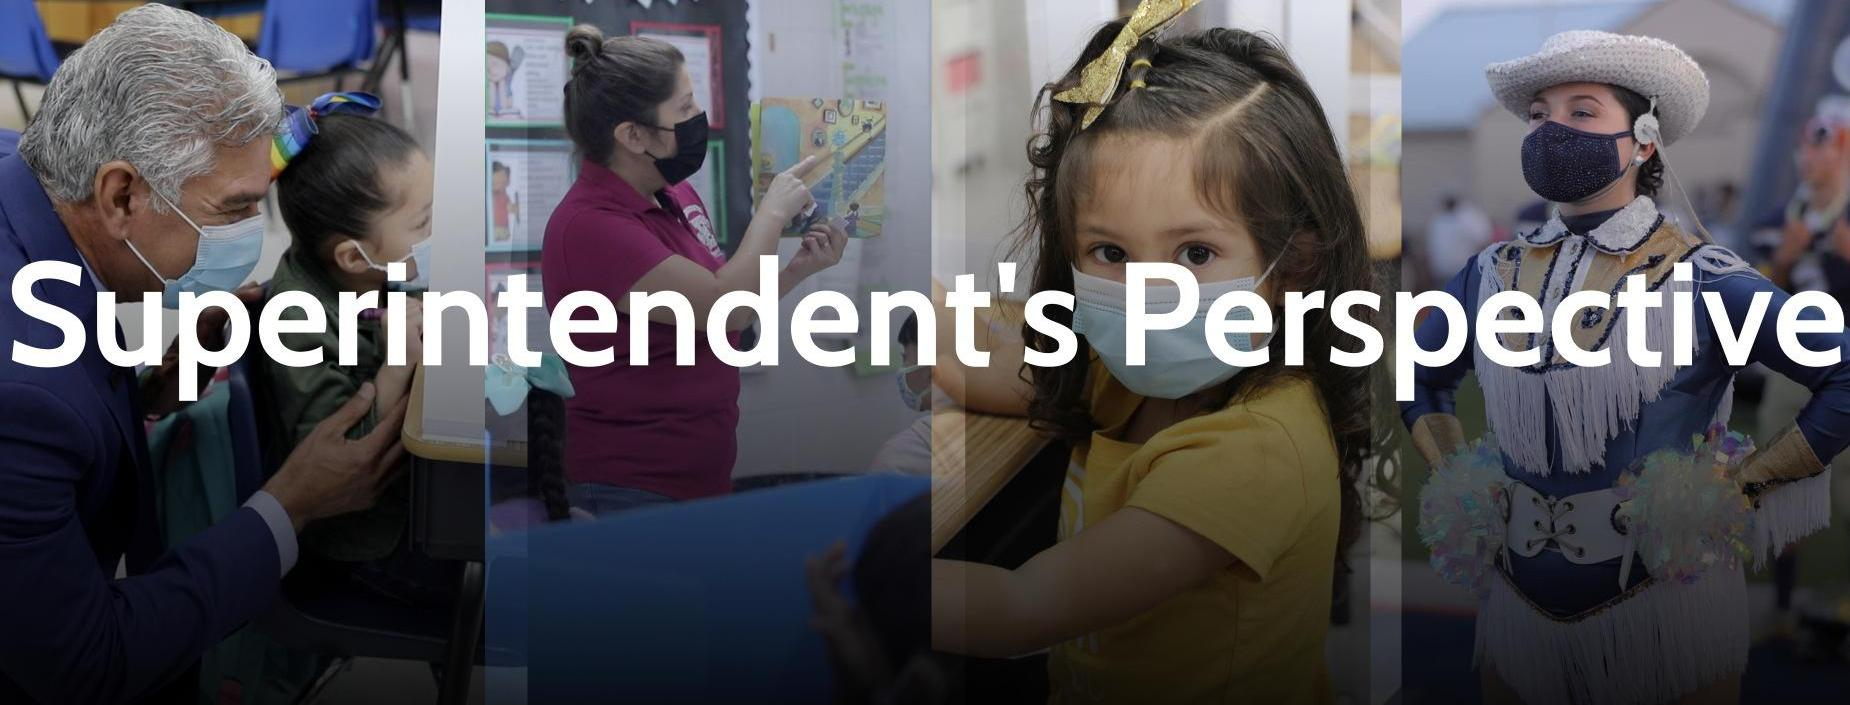 Superintendent's Perspective